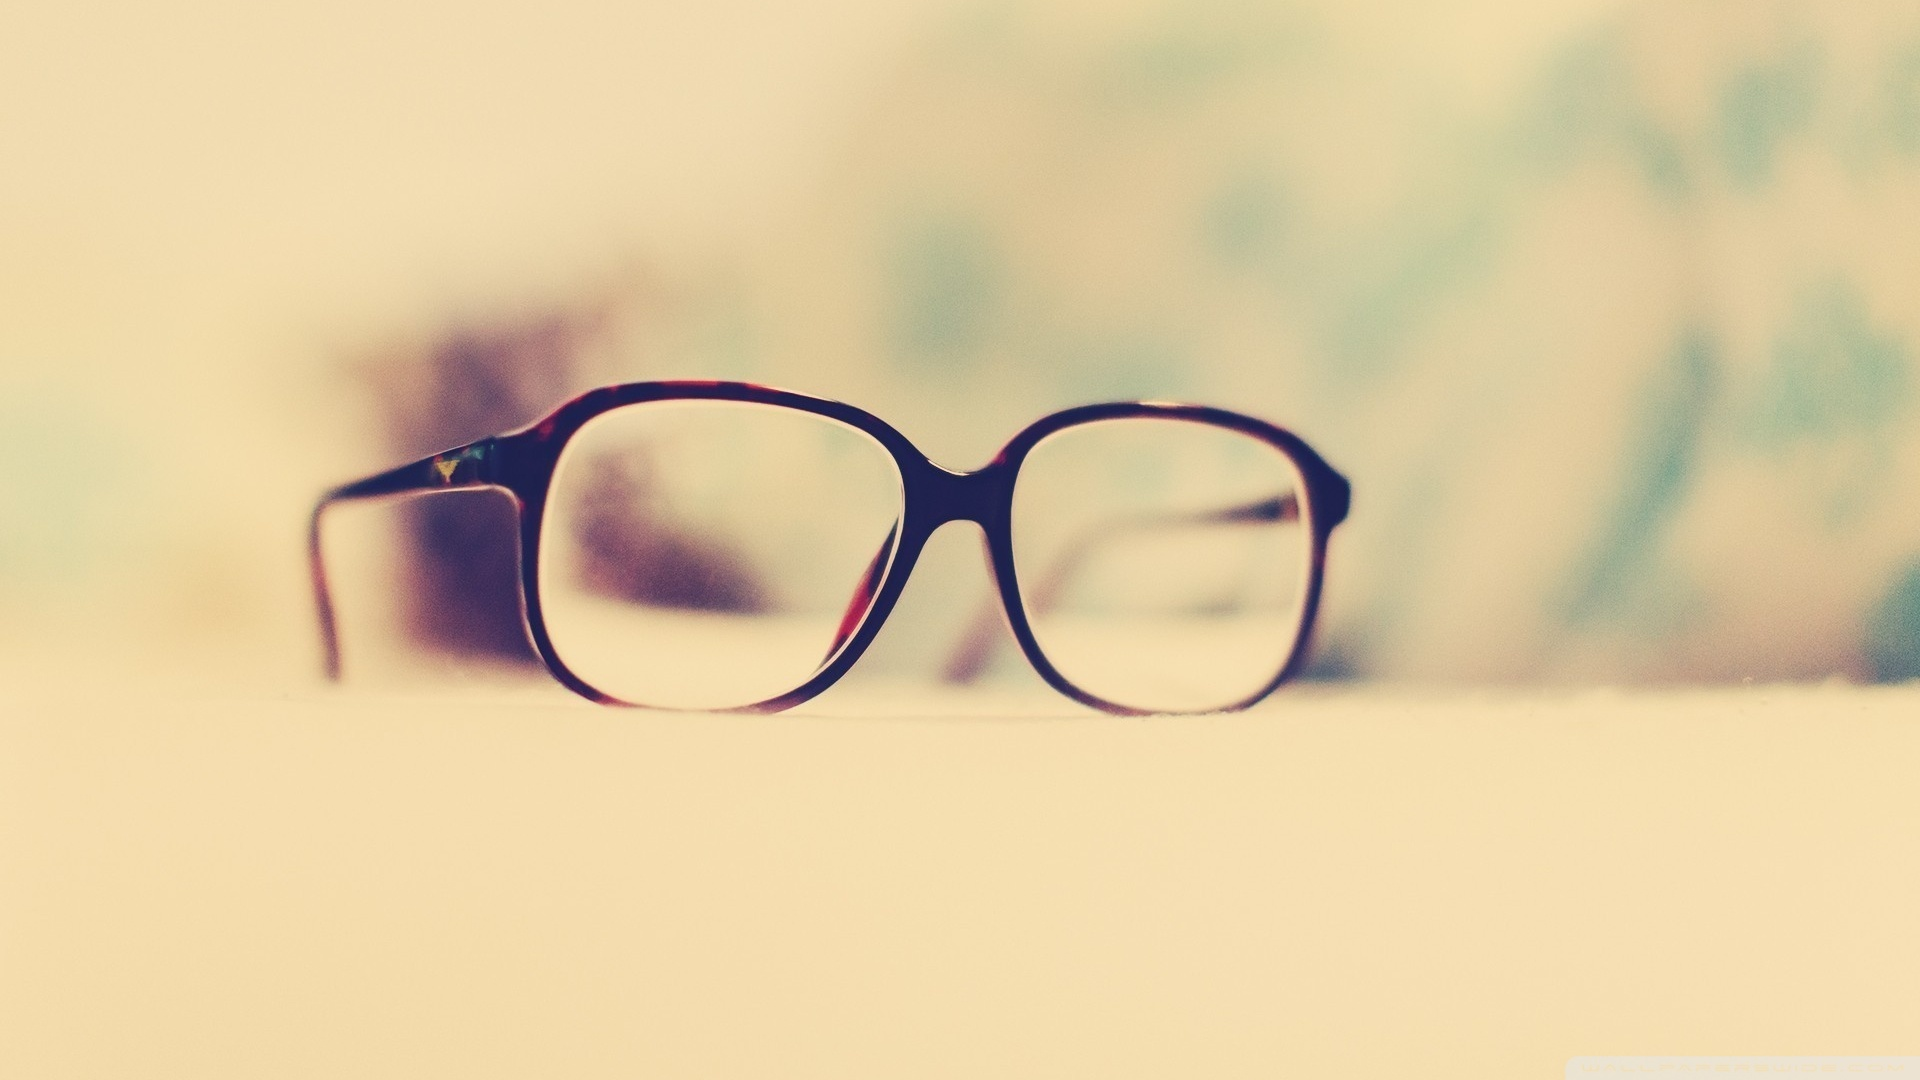 Hipster Glasses Hd Desktop Wallpaper High Definition 1920x1080px